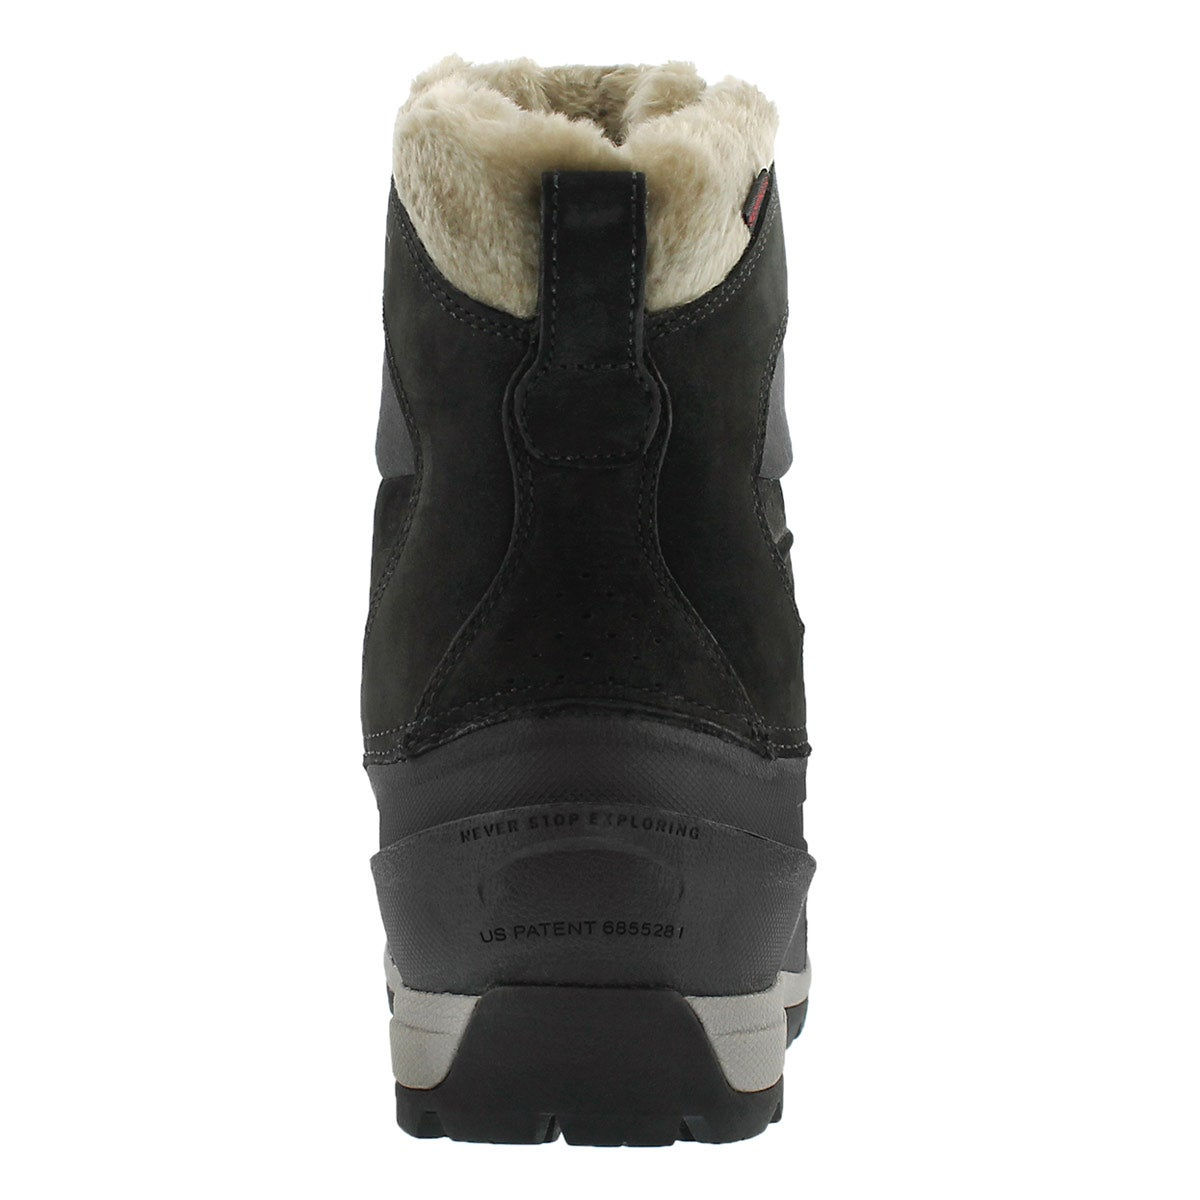 Lds Chilkat 400 black wtpf wntr boot